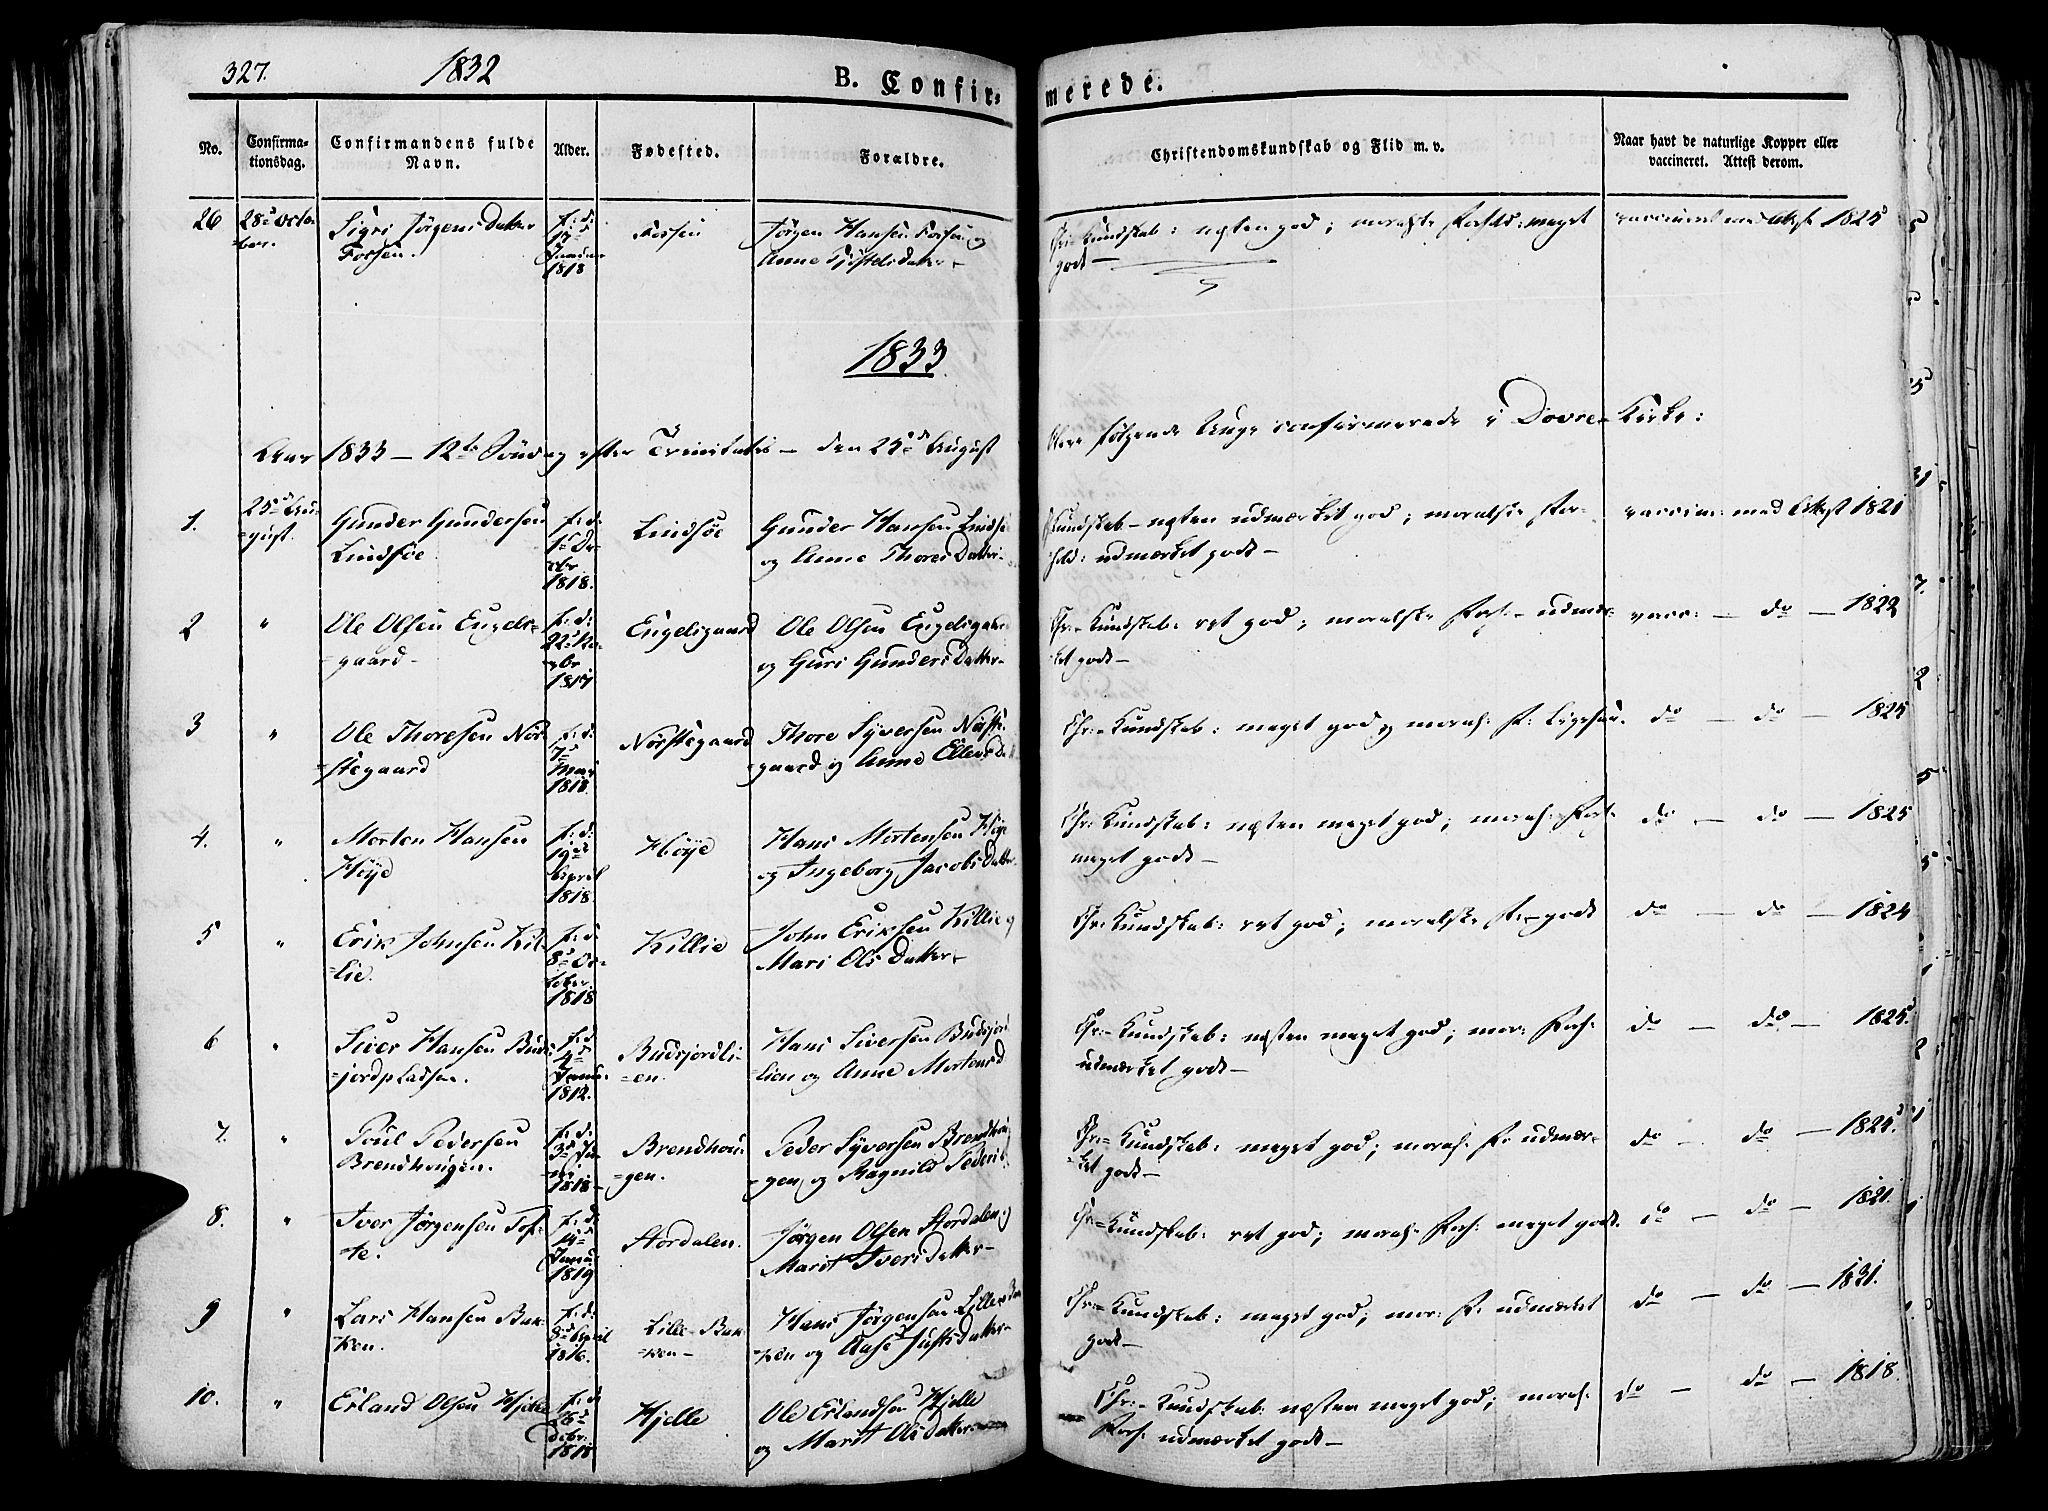 SAH, Lesja prestekontor, Ministerialbok nr. 5, 1830-1842, s. 327